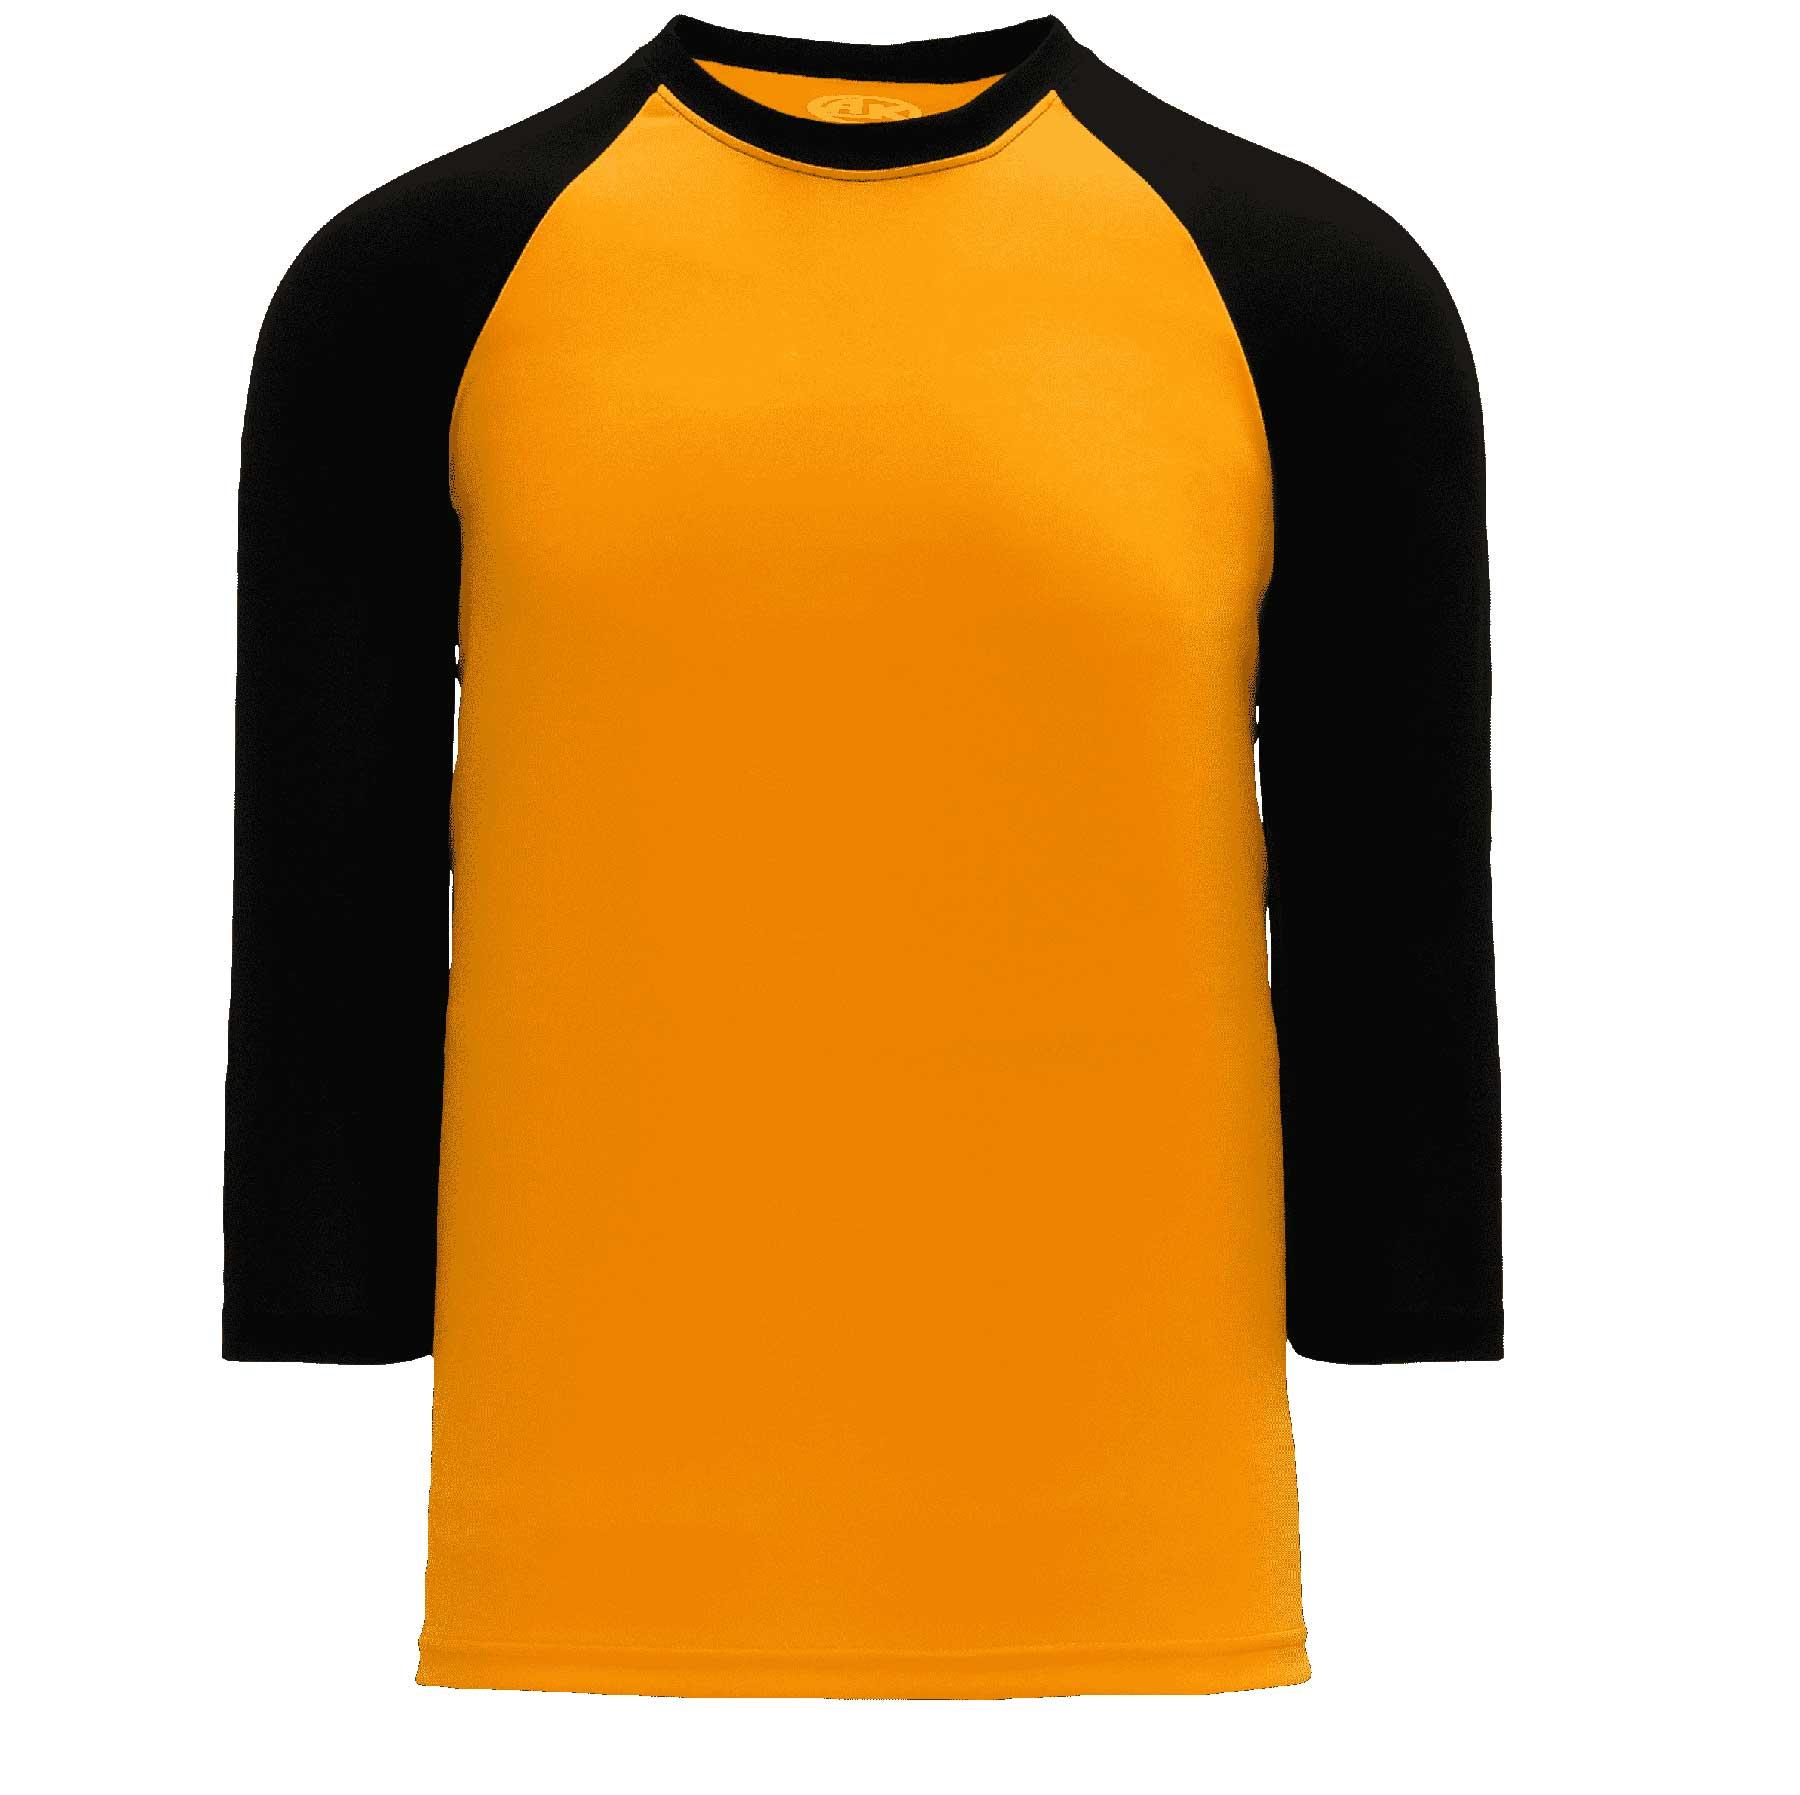 newest a13ef 5b604 Baseball Actiflex Moisture Wicking 3/4 Sleeve Raglan T-Shirt - Gold/Black